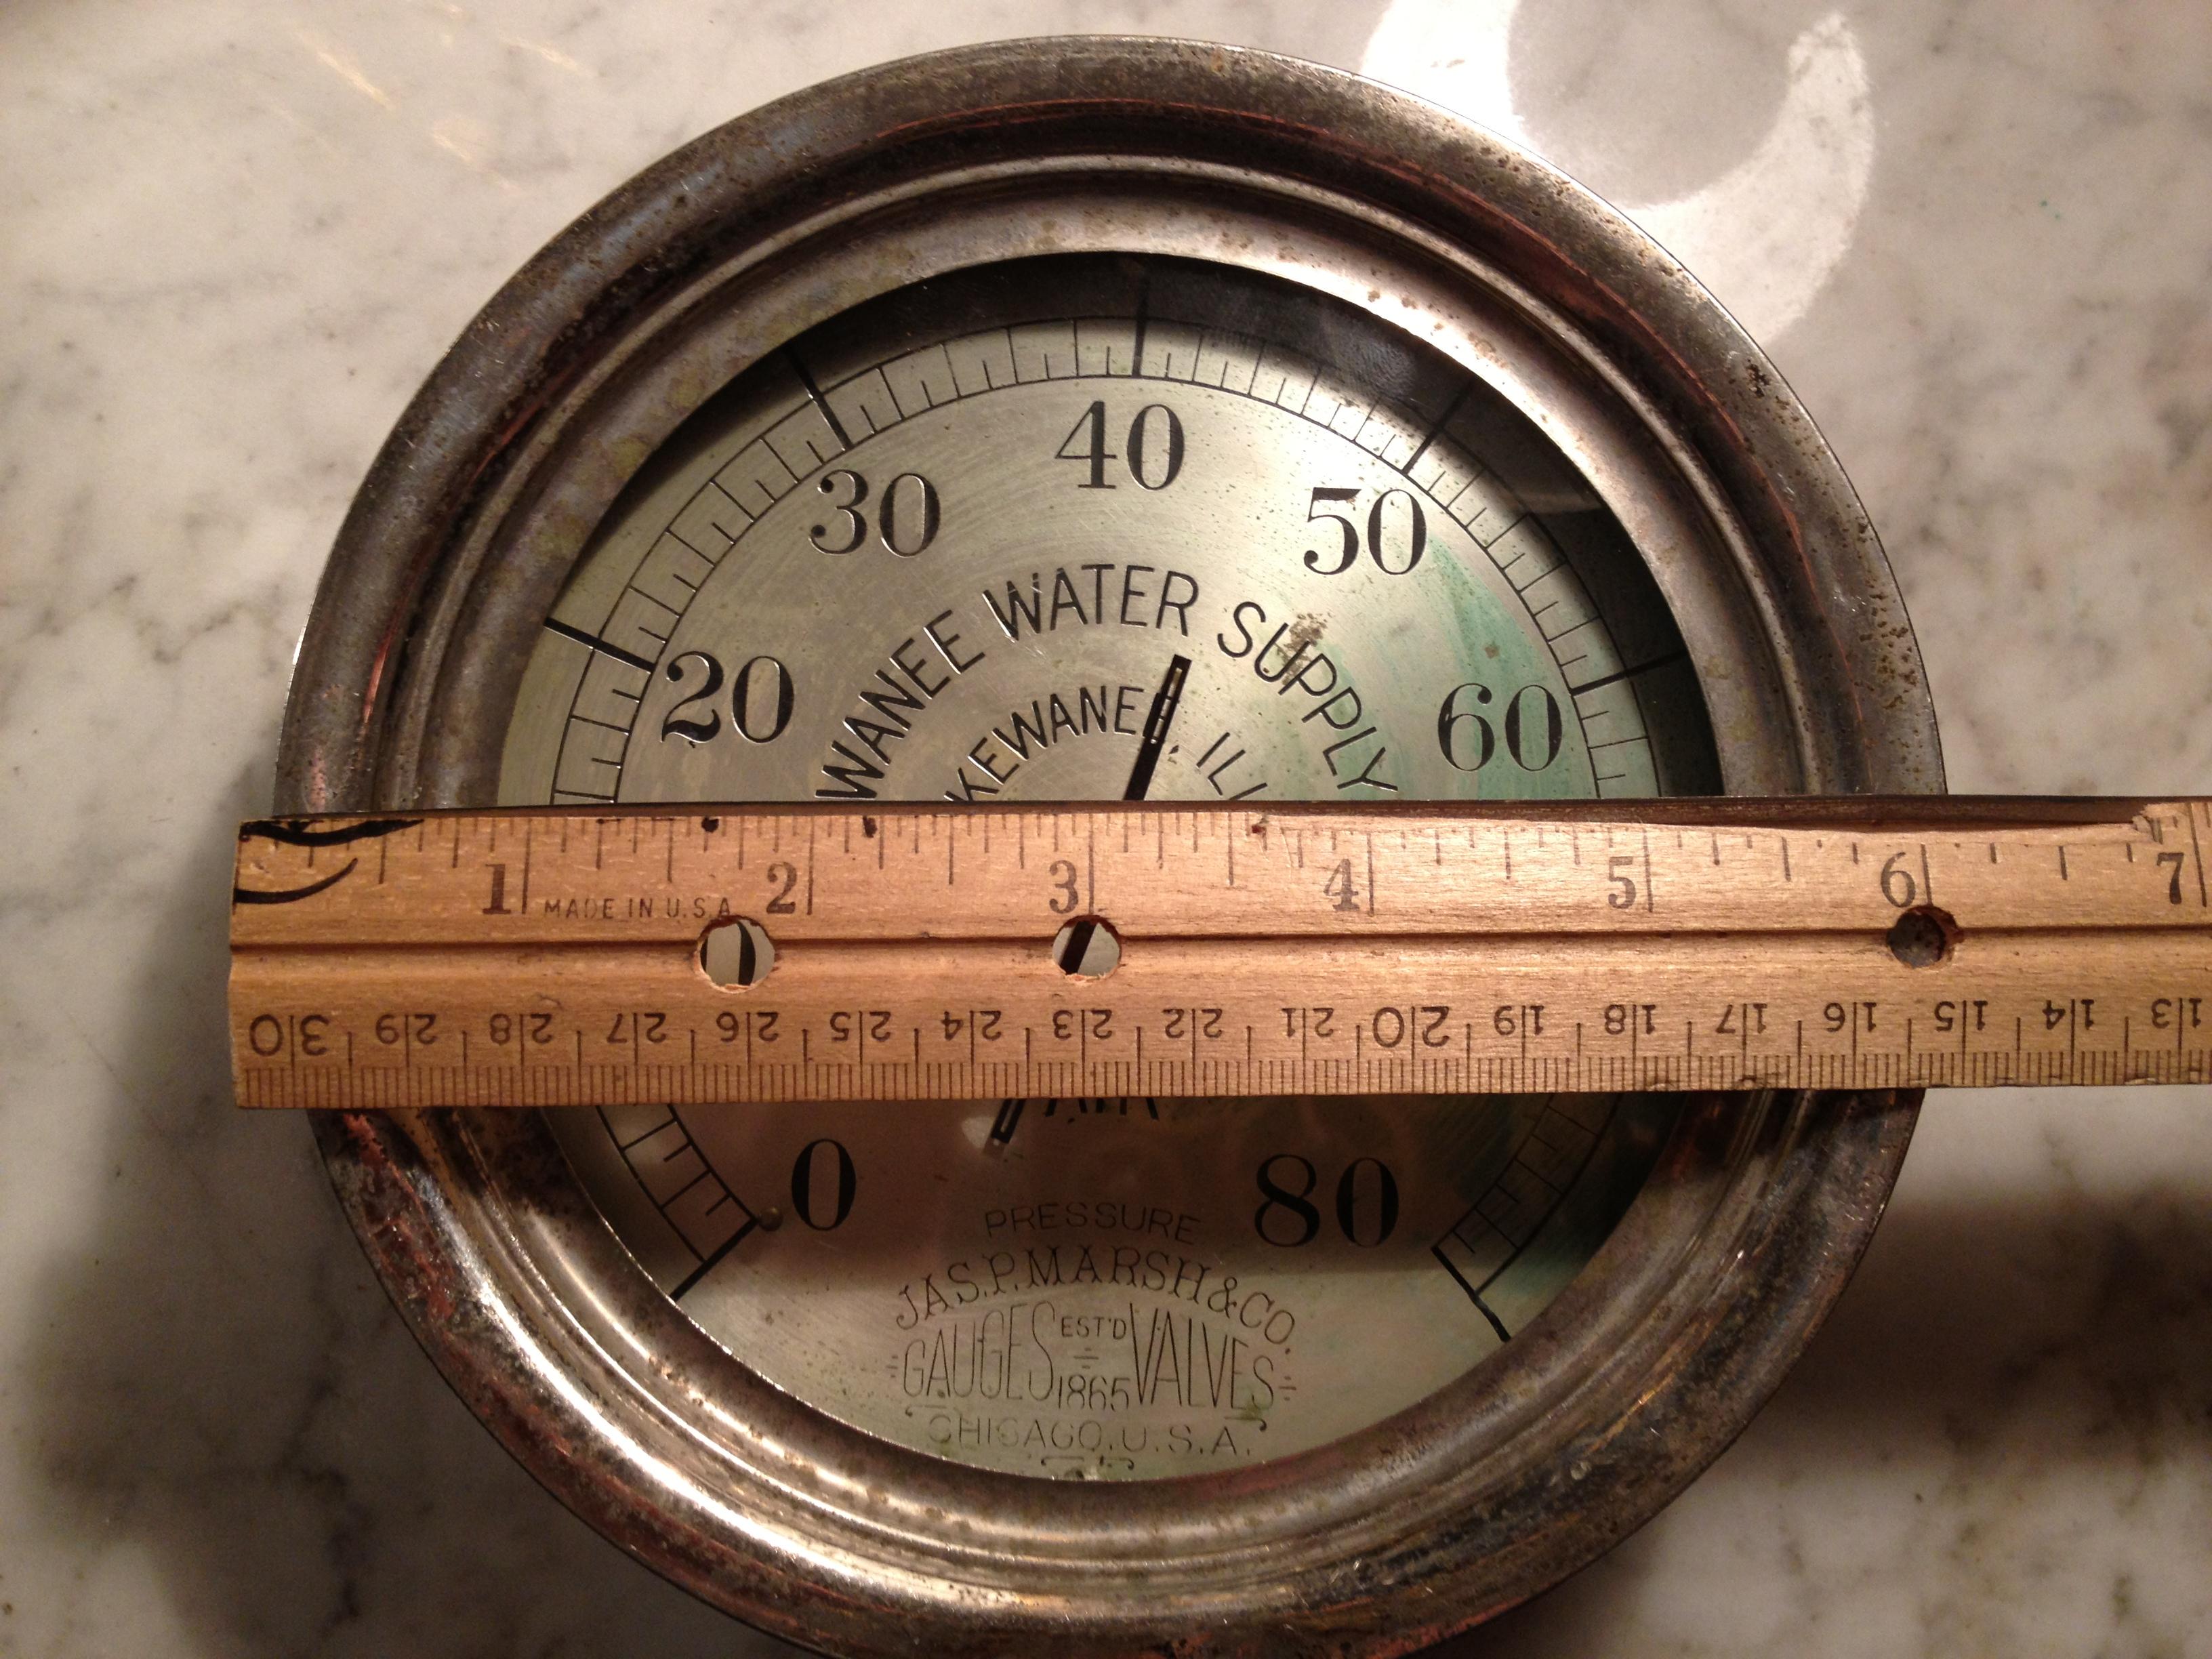 i_gearz_steampunk_hand_made_steam_pressure_gauge_clock_6_battery_op_antique_vintage_clocks_4.JPG